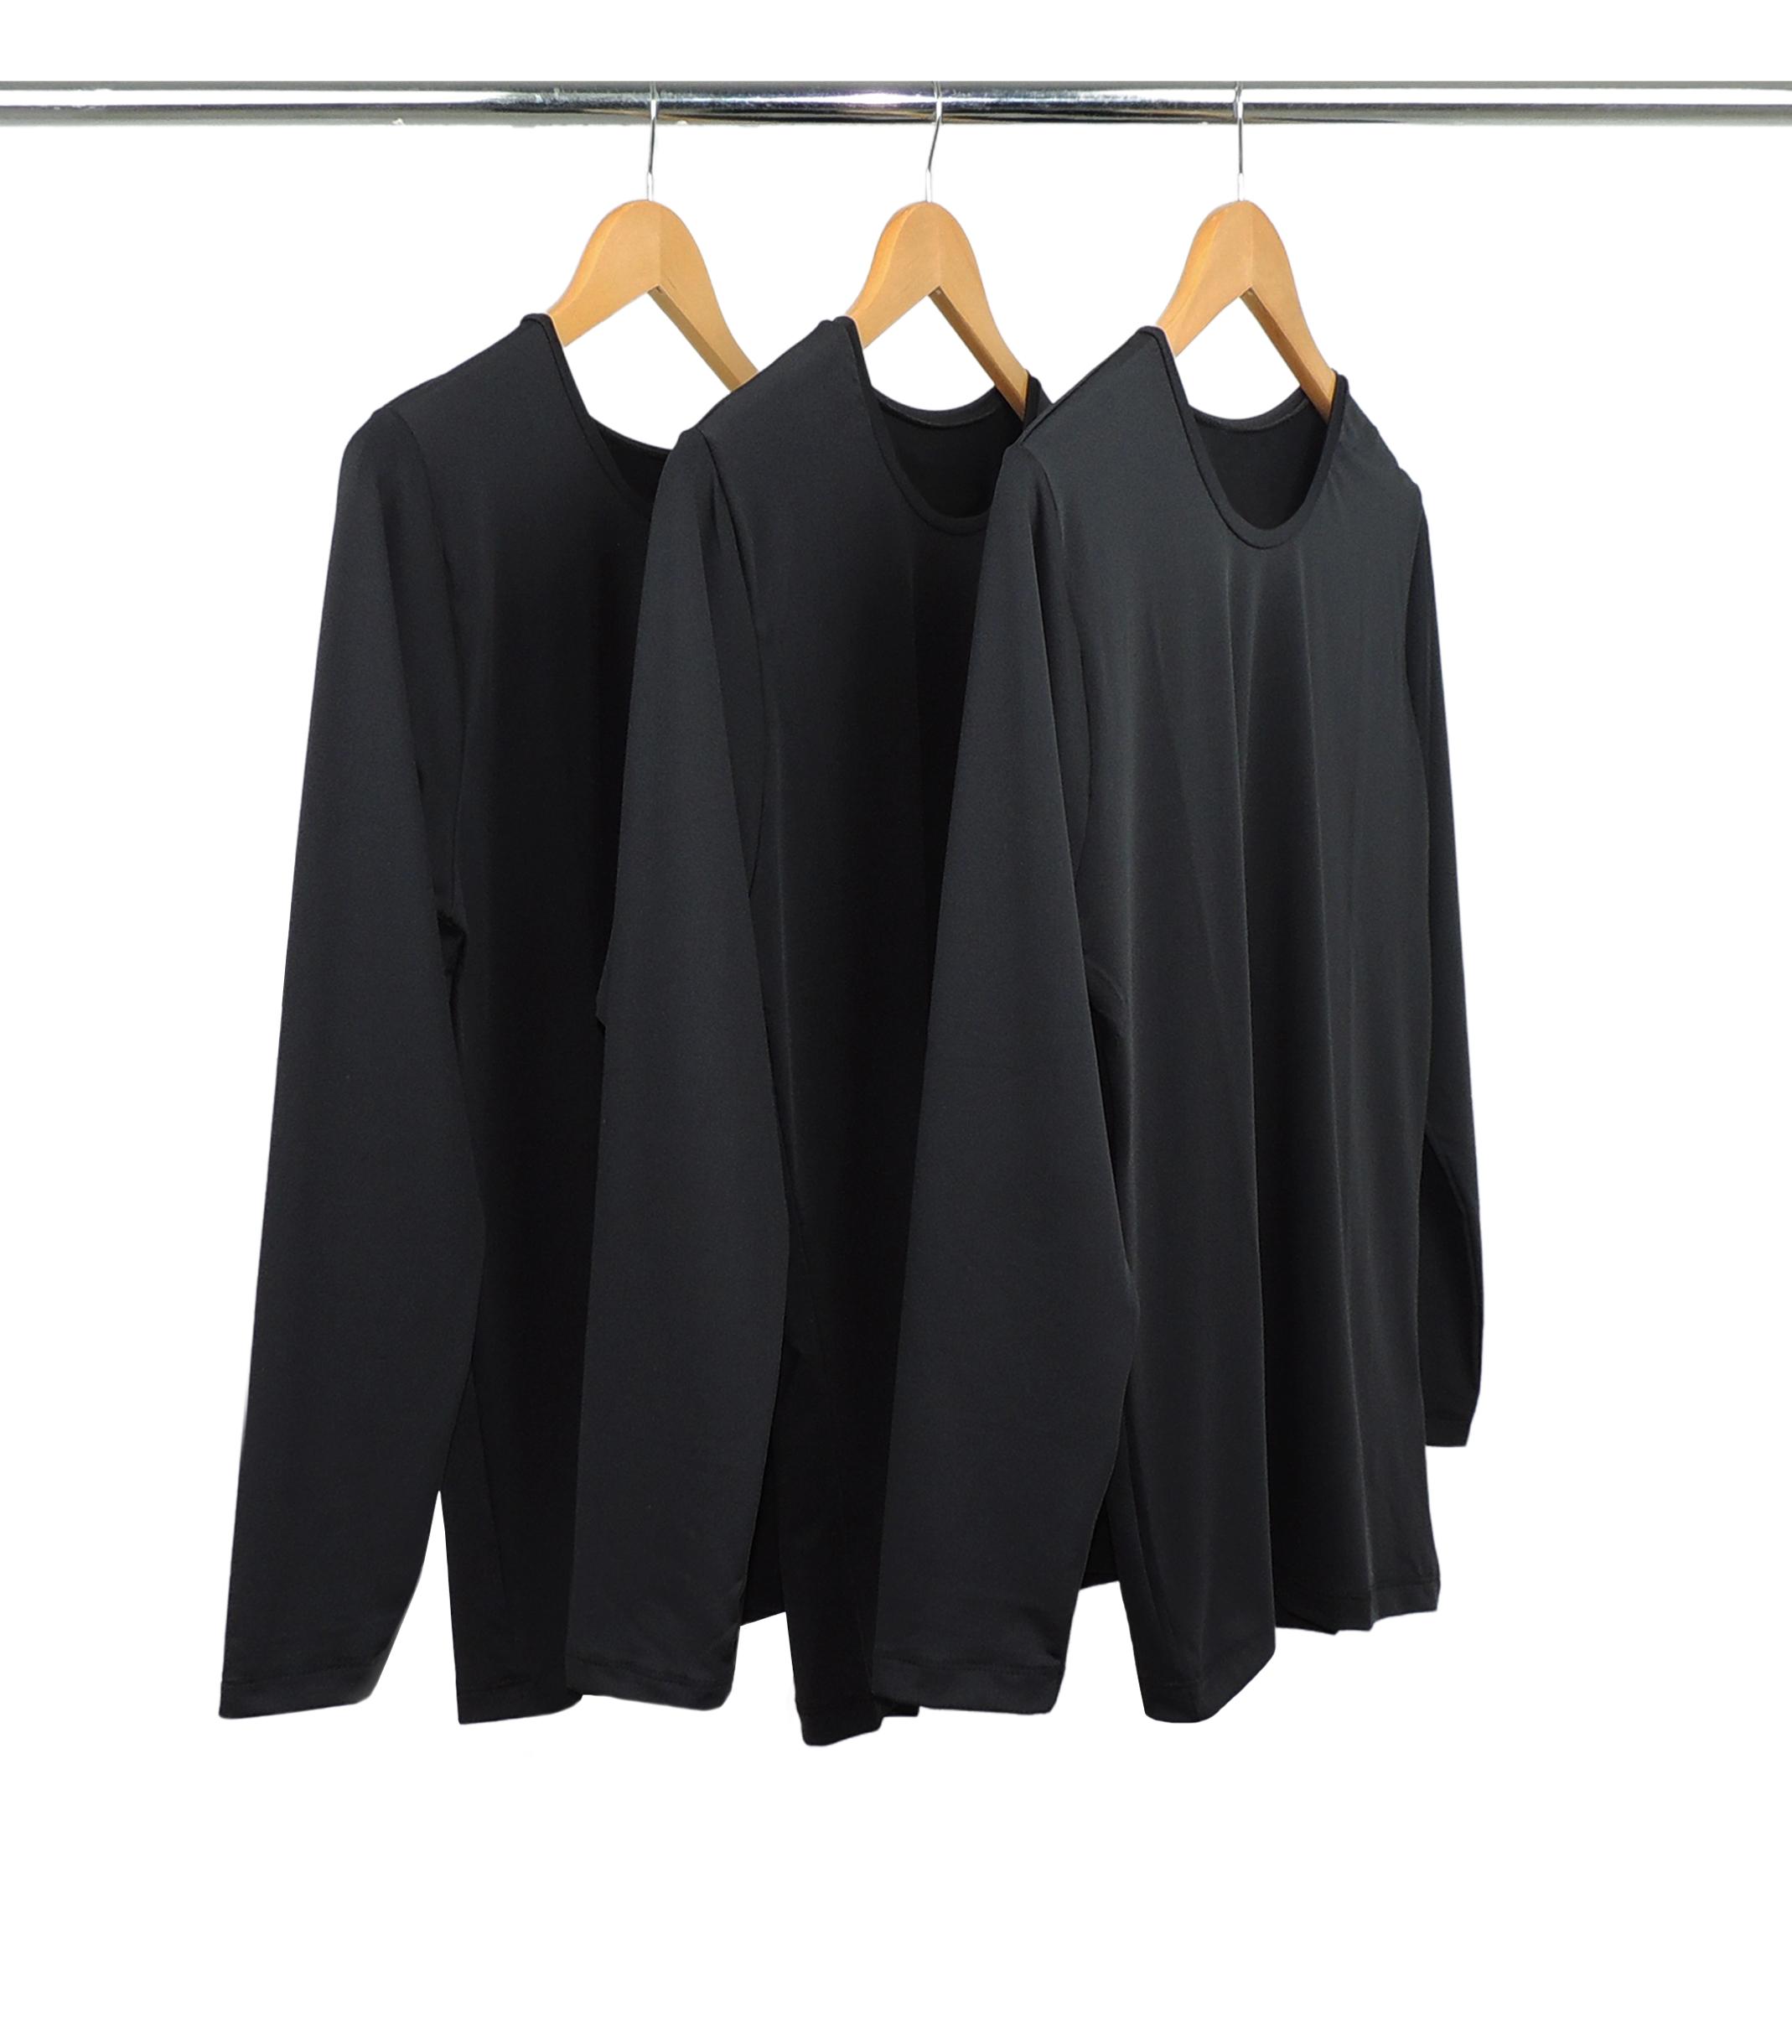 Kit 5 Camisetas Segunda Pele Manga Longa Masculina Preta UV 50+